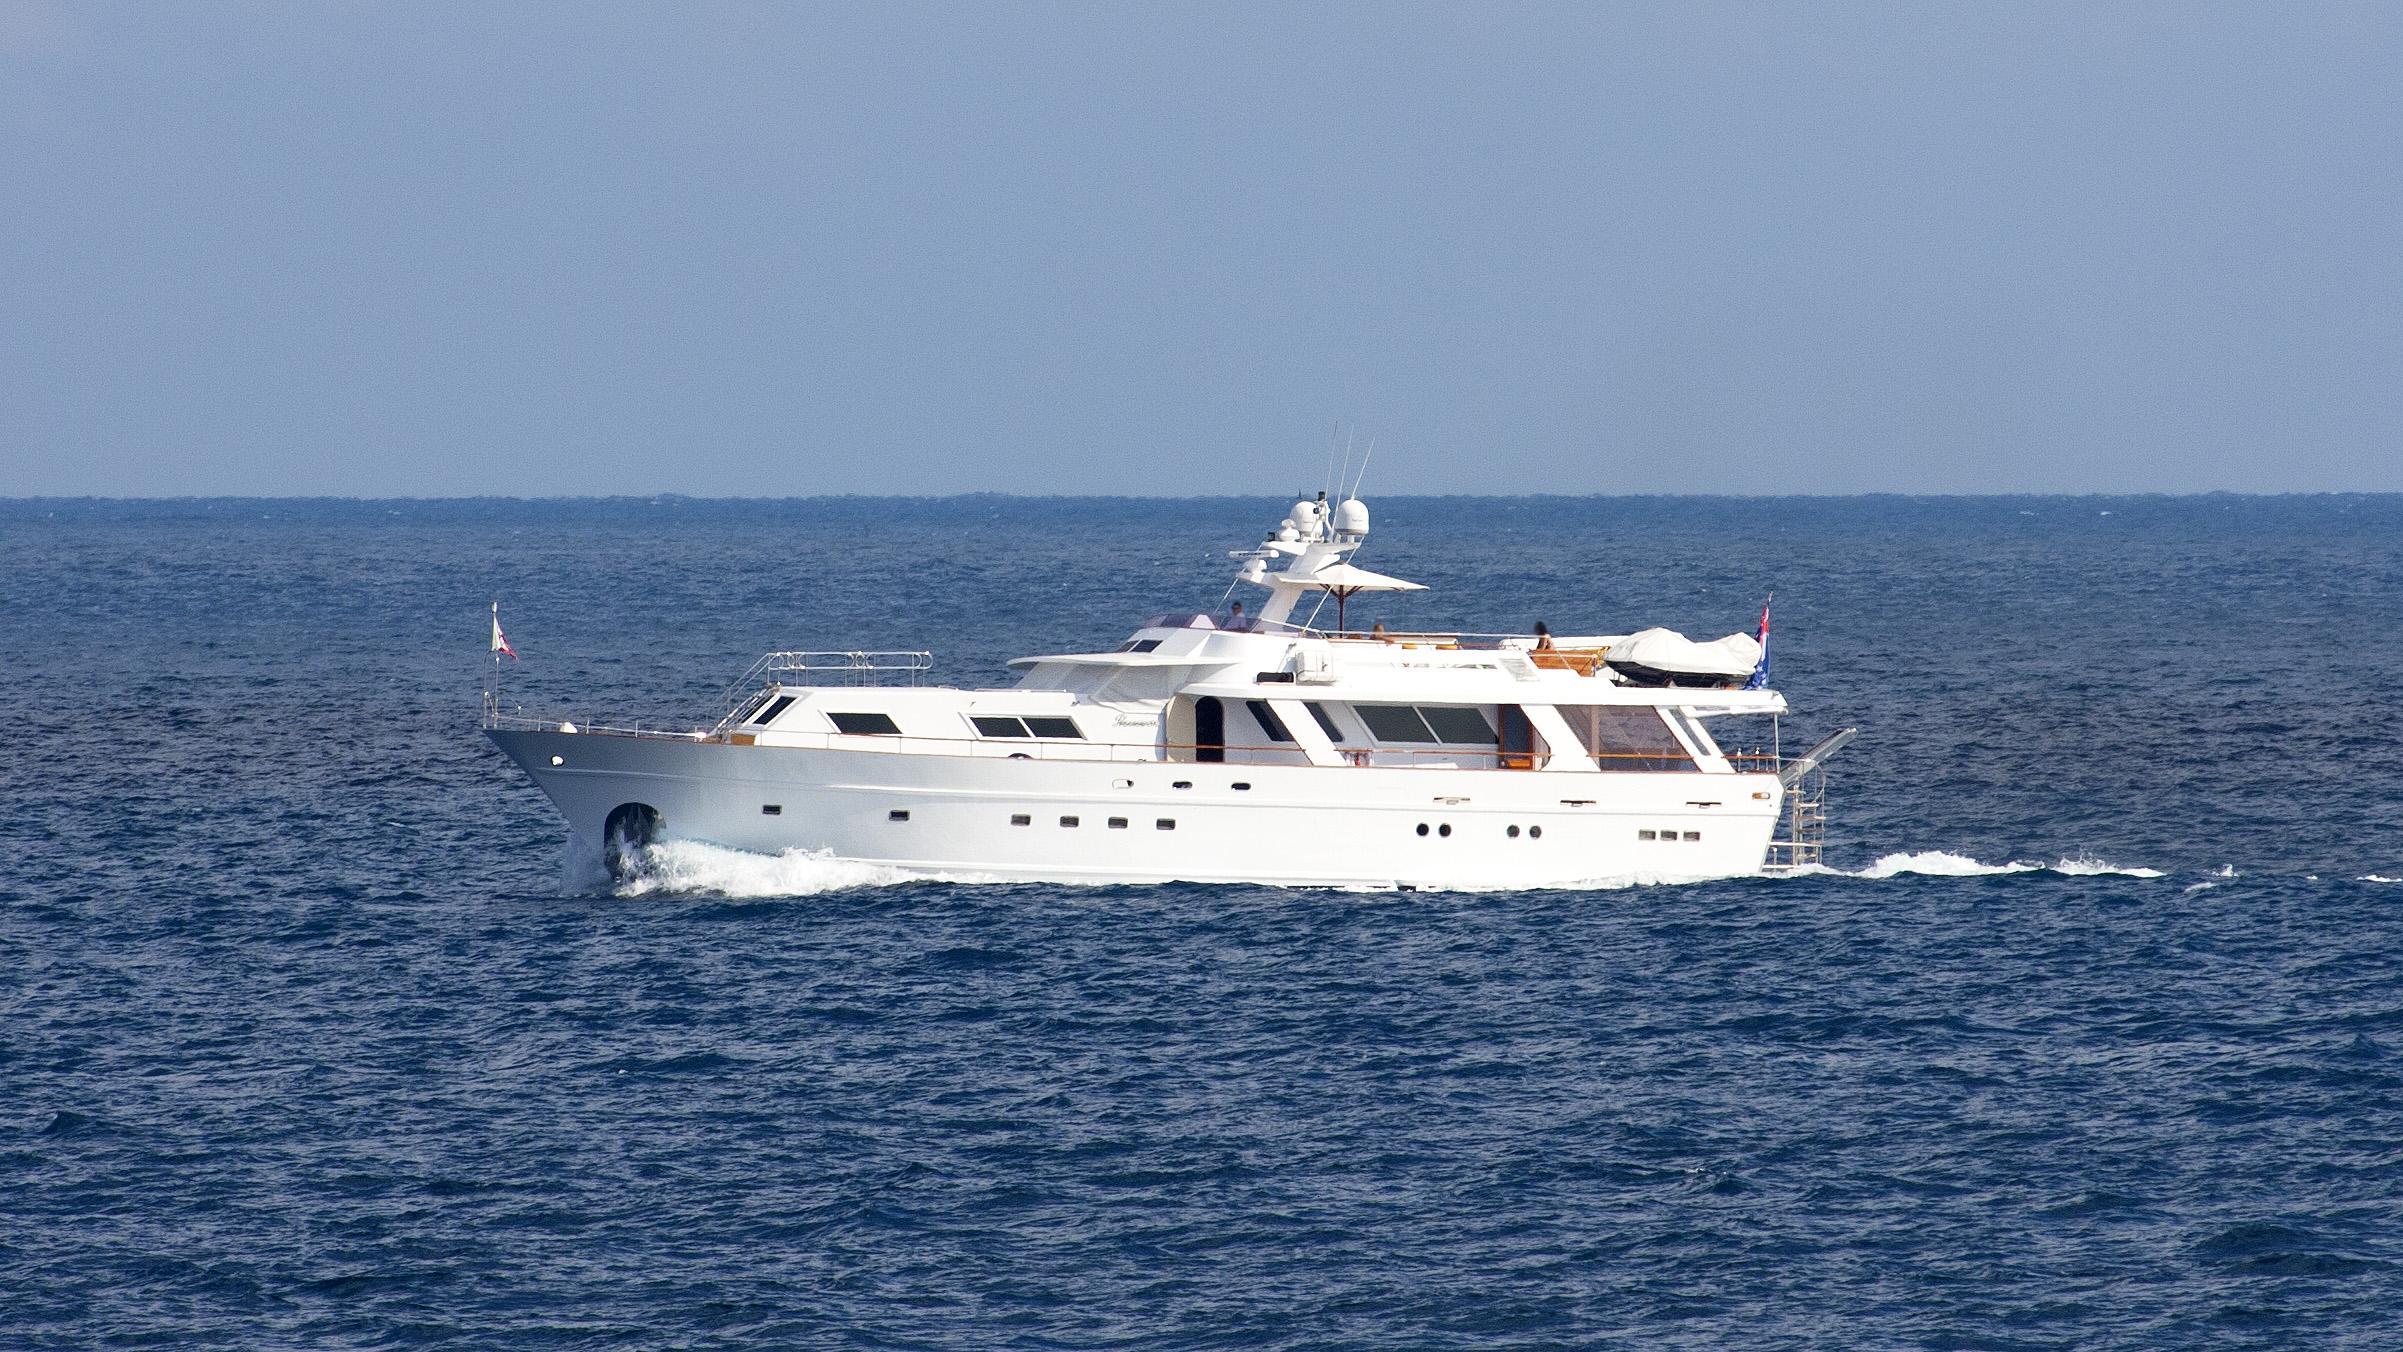 passionat-motoryacht-udondo-1973-27m-profile-running